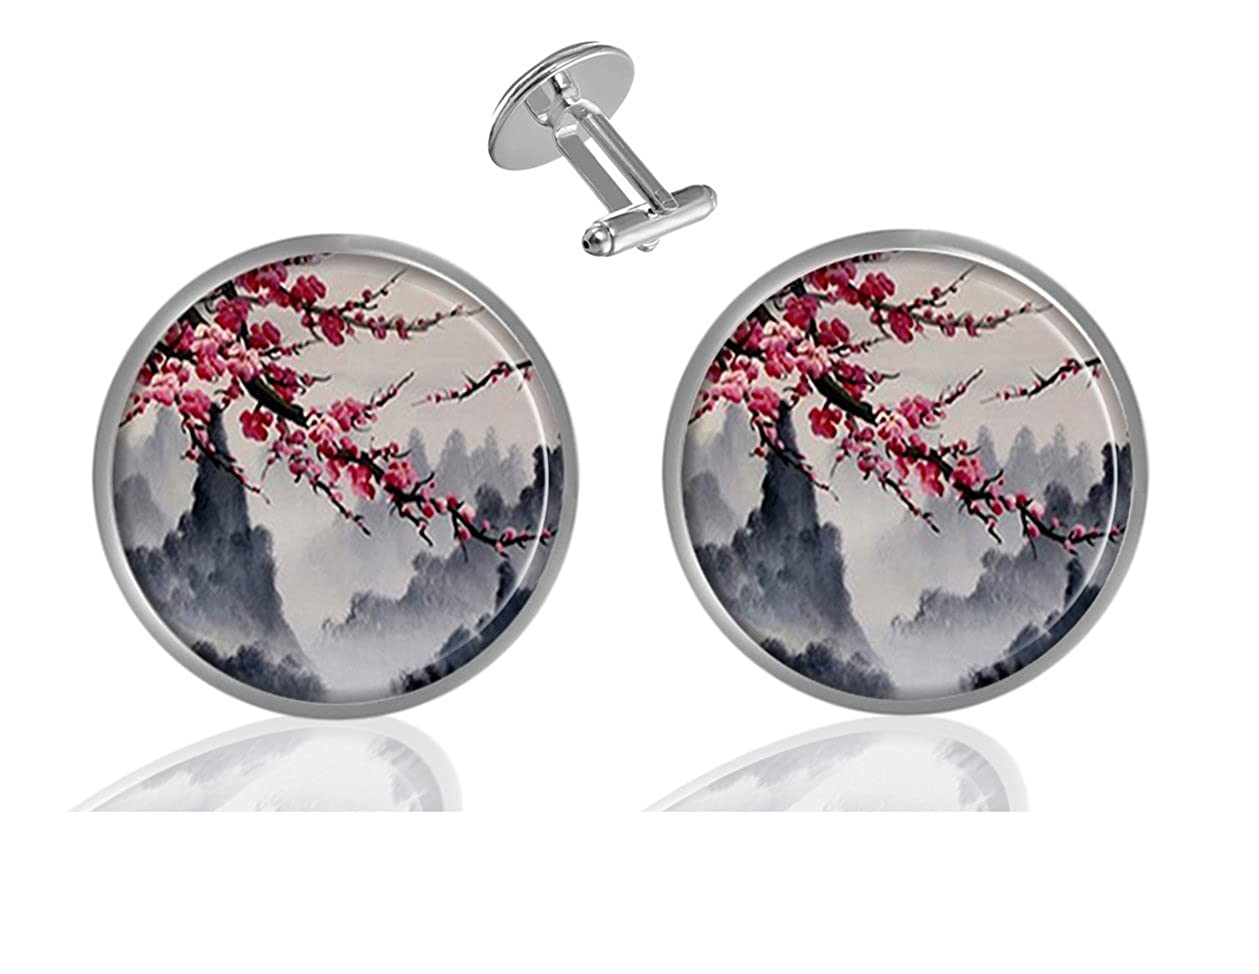 Sechao Cherry Blossom Tree Custom Elegant Personalized Business Wedding Shirt Formal Cufflinks Kit B07G3R12FN_US